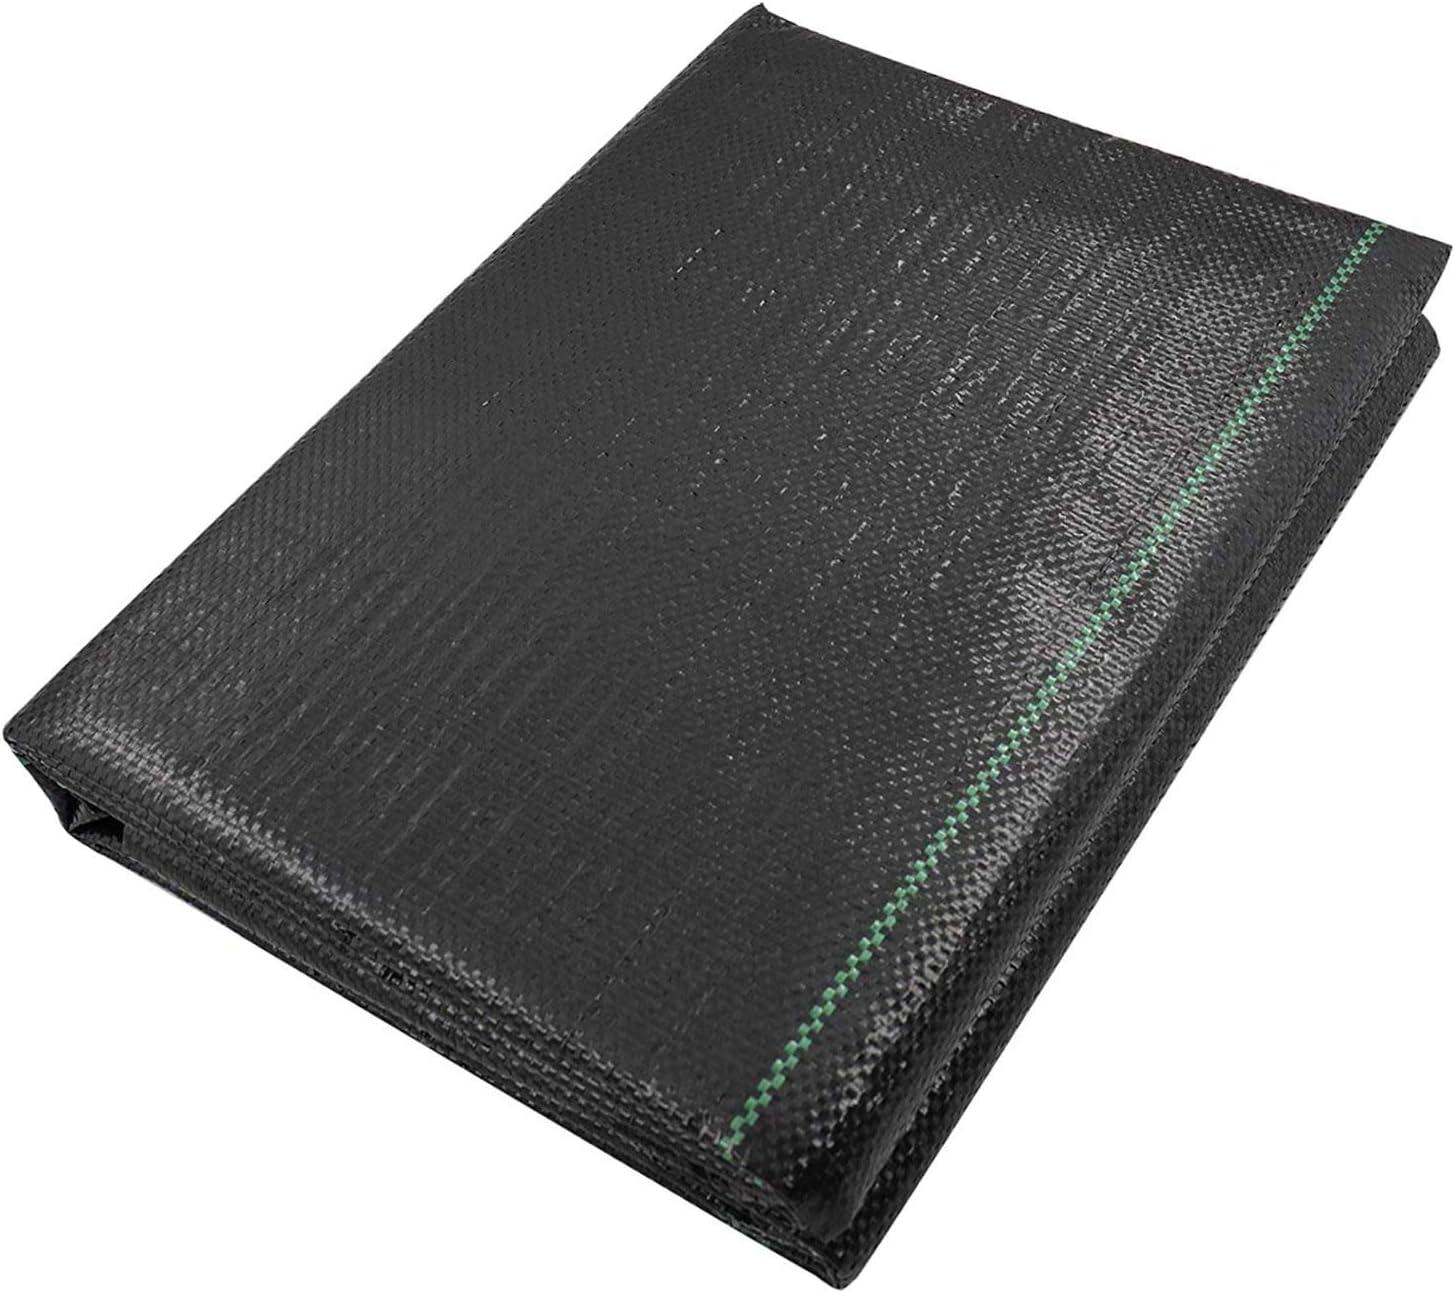 Now free shipping FuXing Weed Control Fabric Classic Membrane Landscape Garden Wo Mat